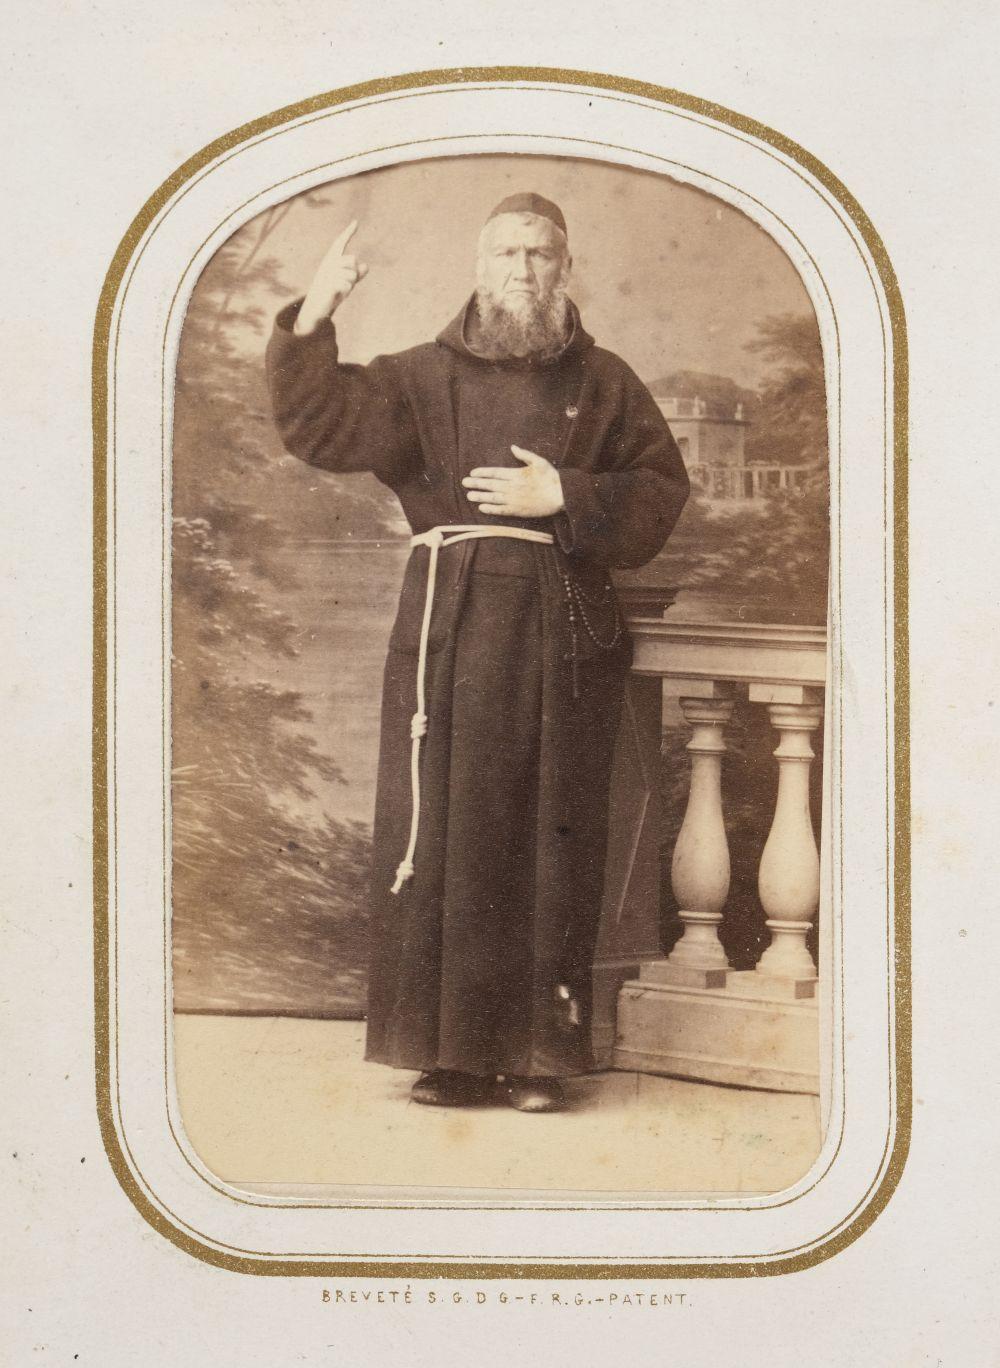 * Cartes de visite. A cartes-de-visite album, c. 1860s/1880s - Image 15 of 18